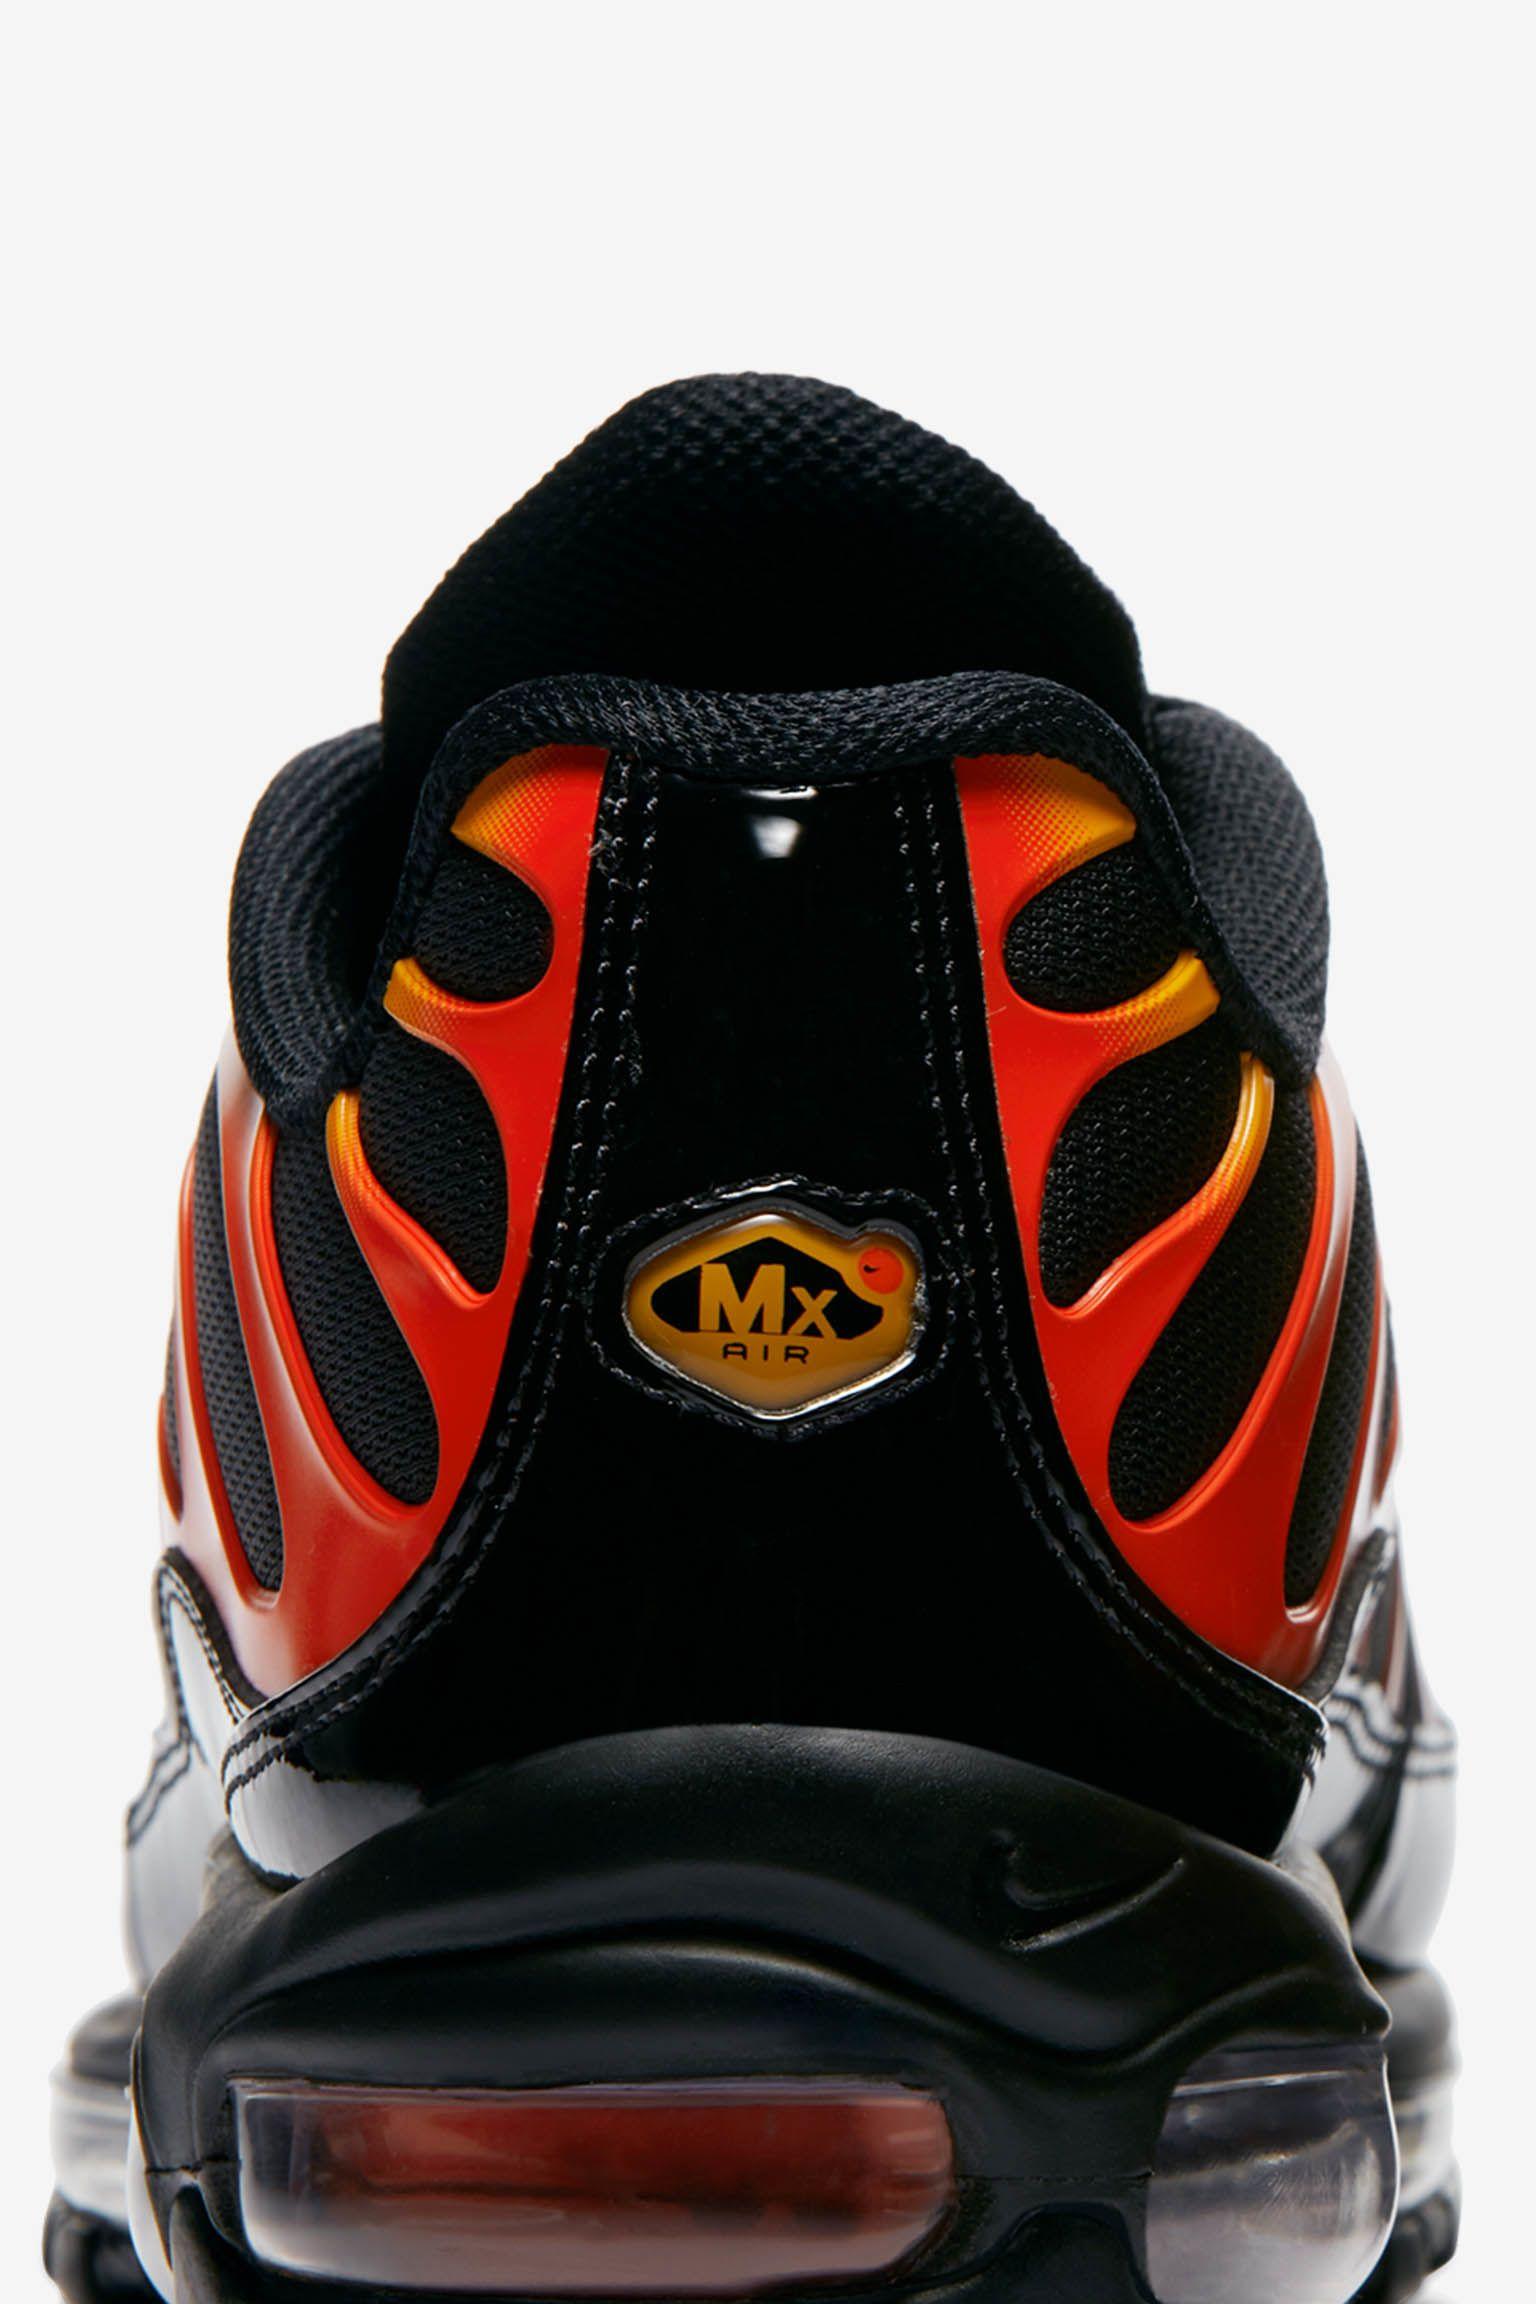 Nike Air Max 97 / Plus 'Shock Orange & Black' Release Date. Nike SNKRS